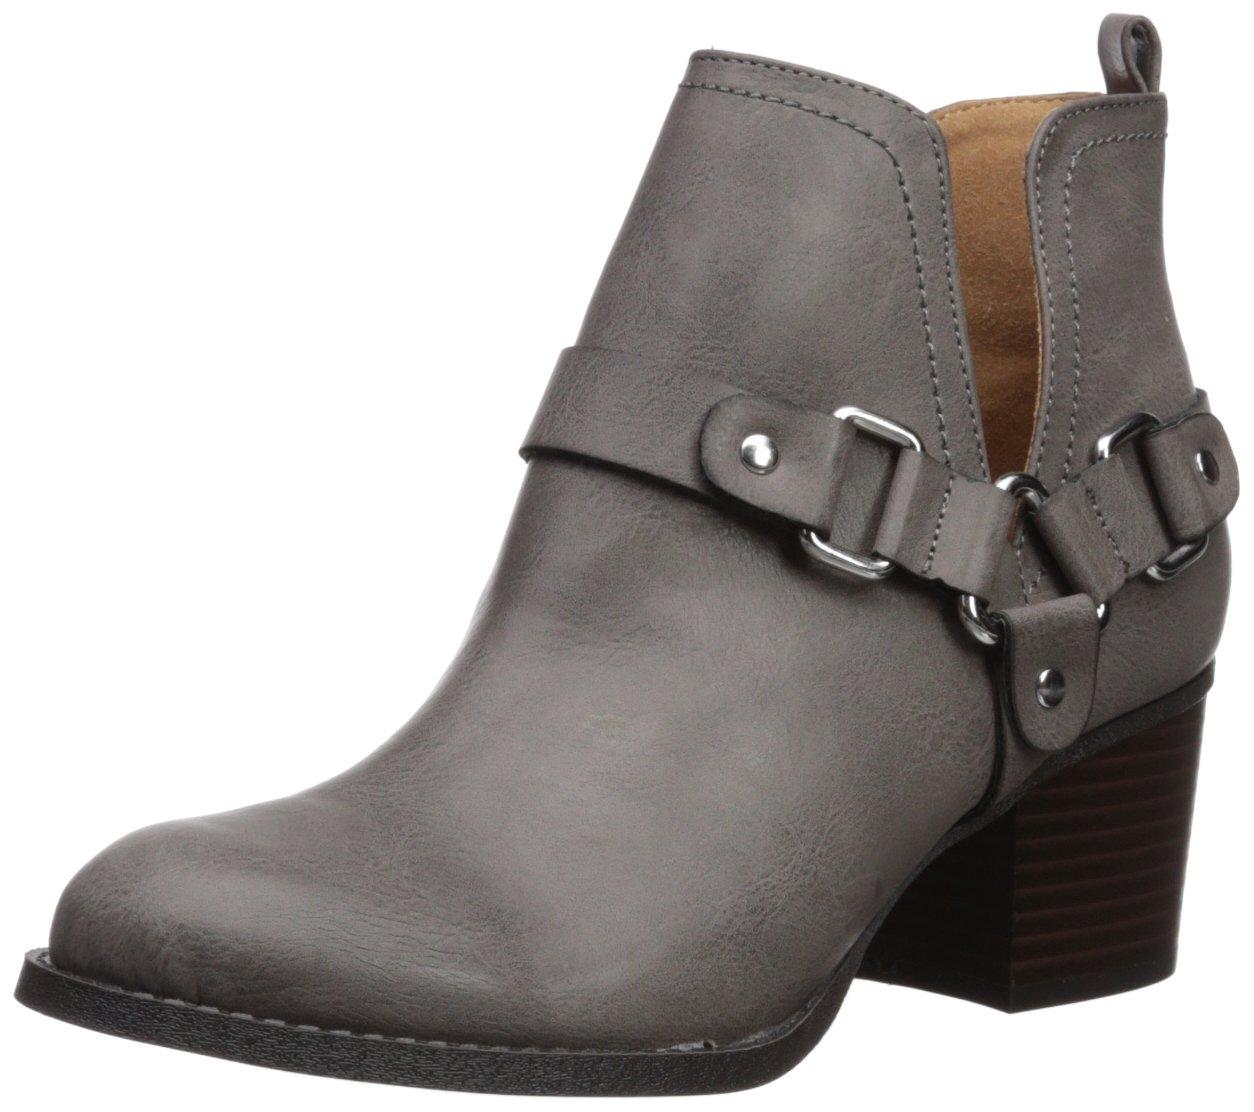 Madden Girl Women's Finian Ankle Boot B074ZBNPS9 8 B(M) US|Dark Grey